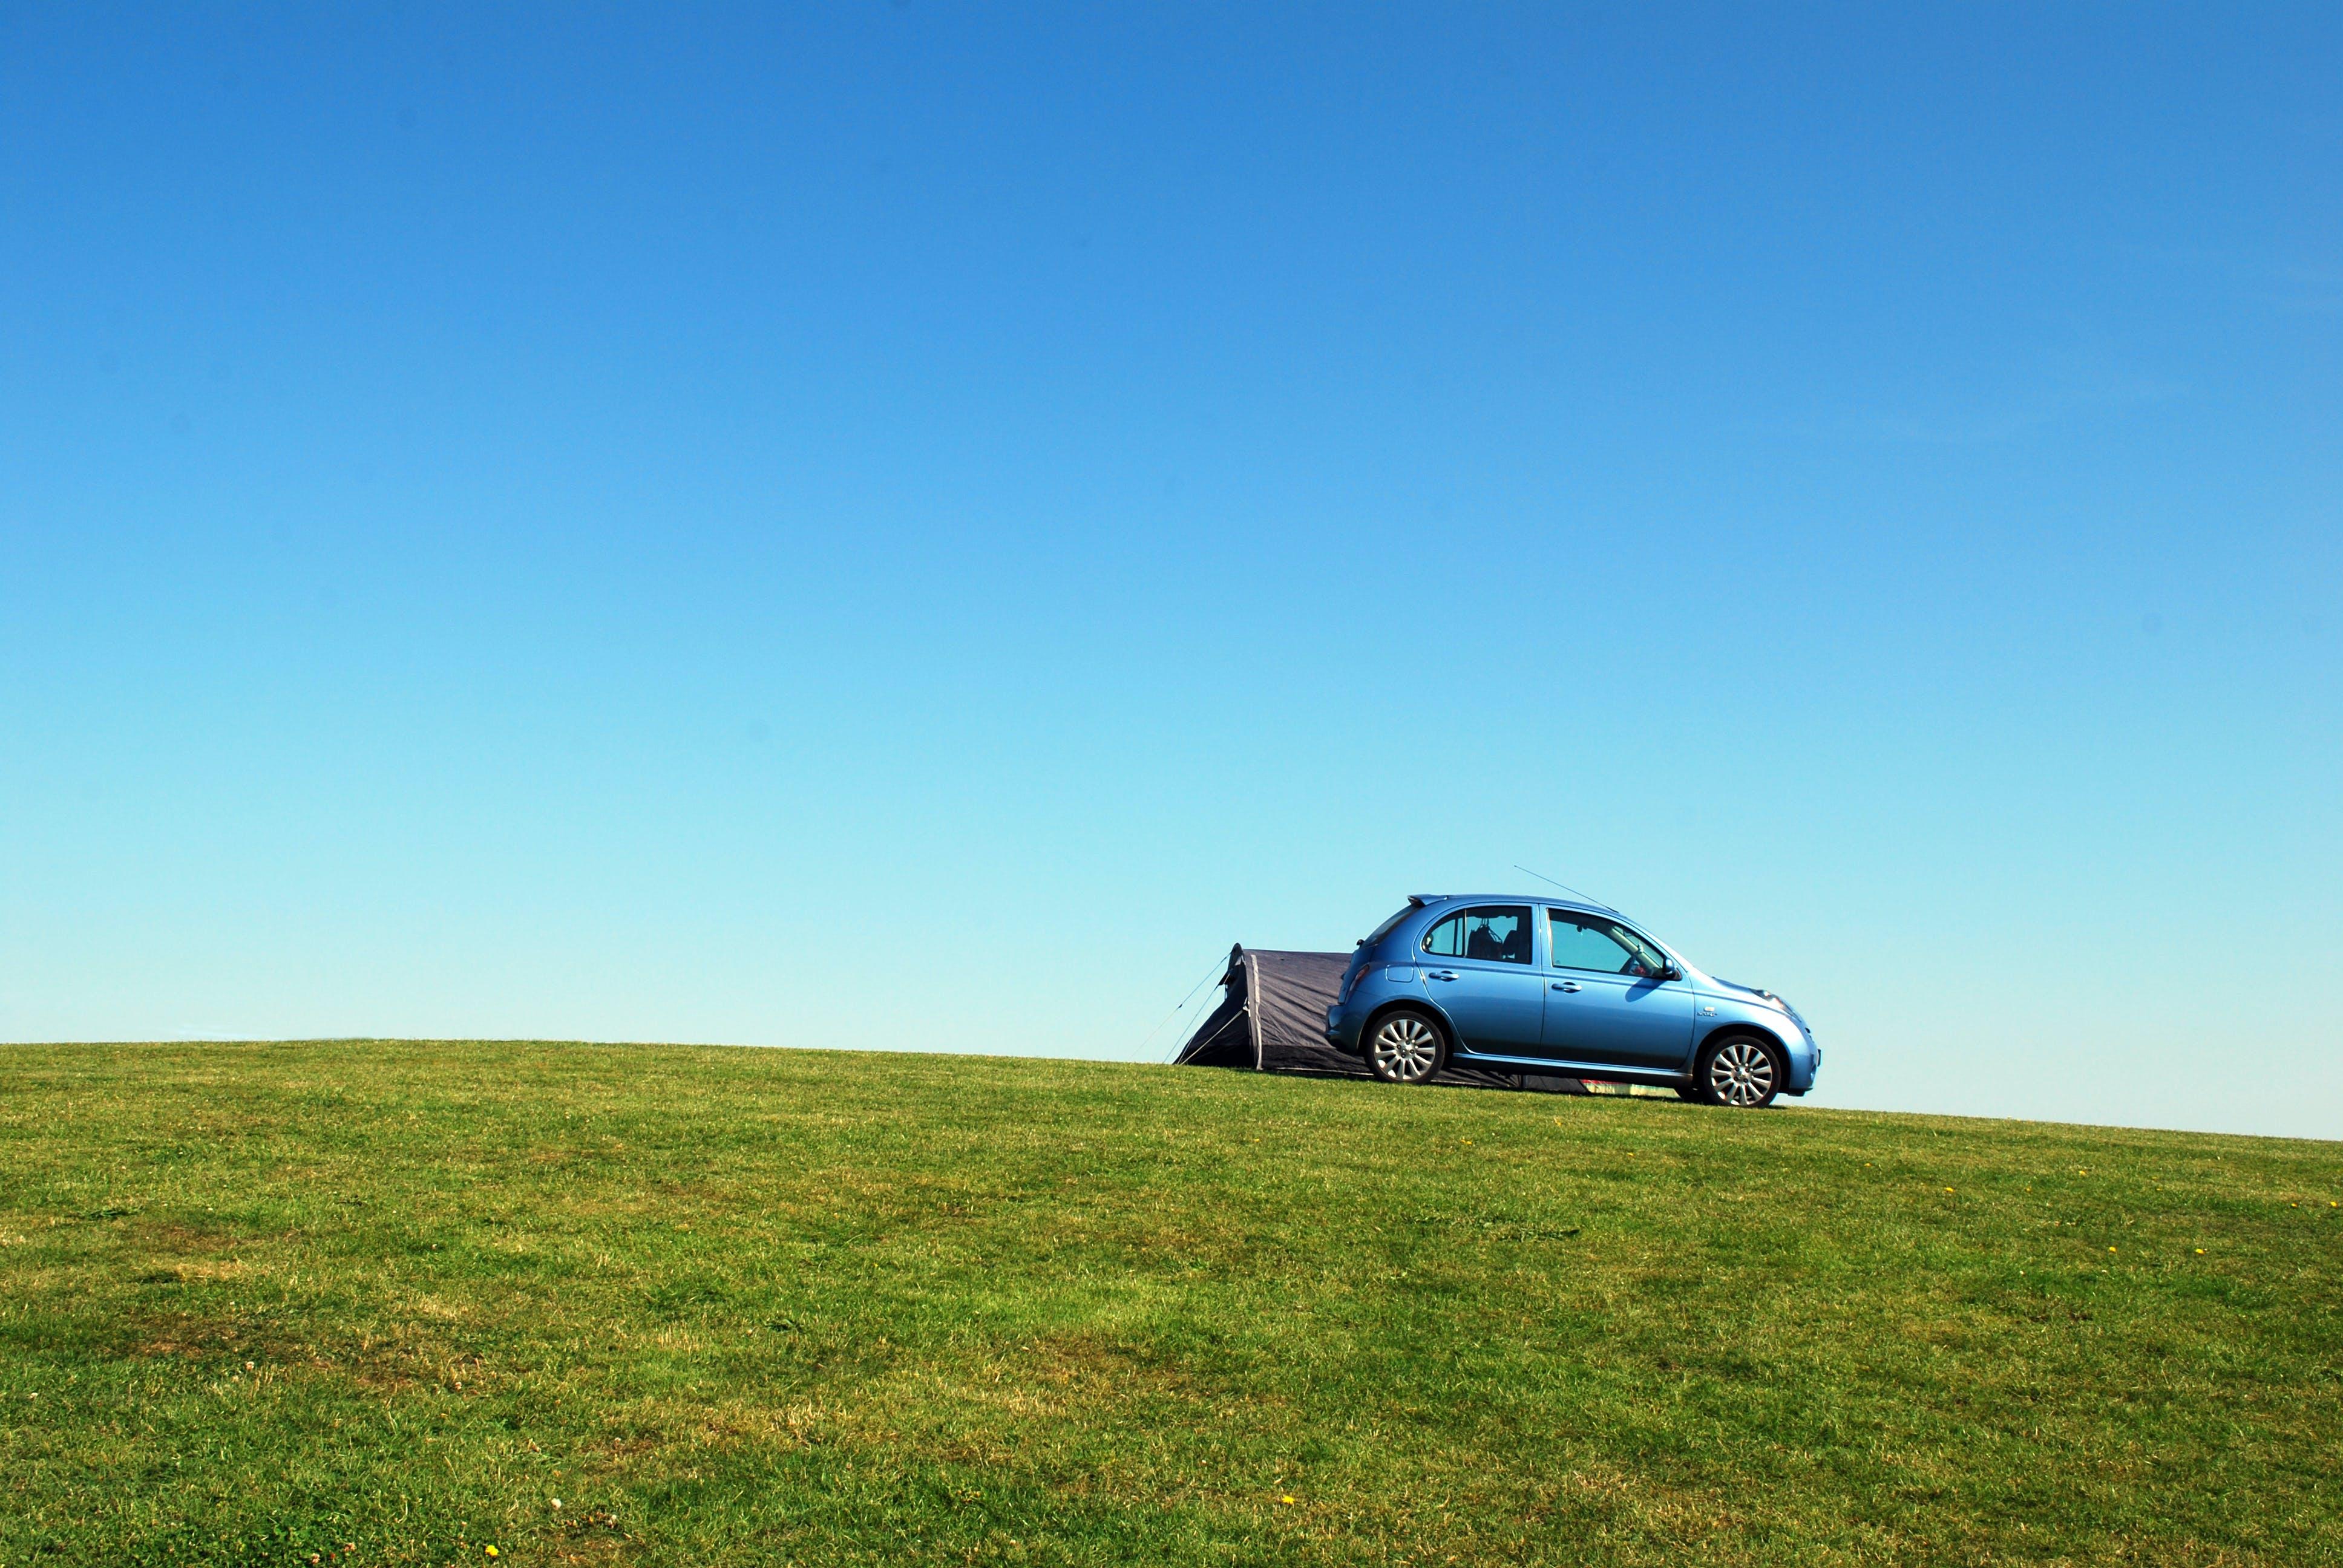 Blue Hatchback On Green Grass Field Under Blue Sky